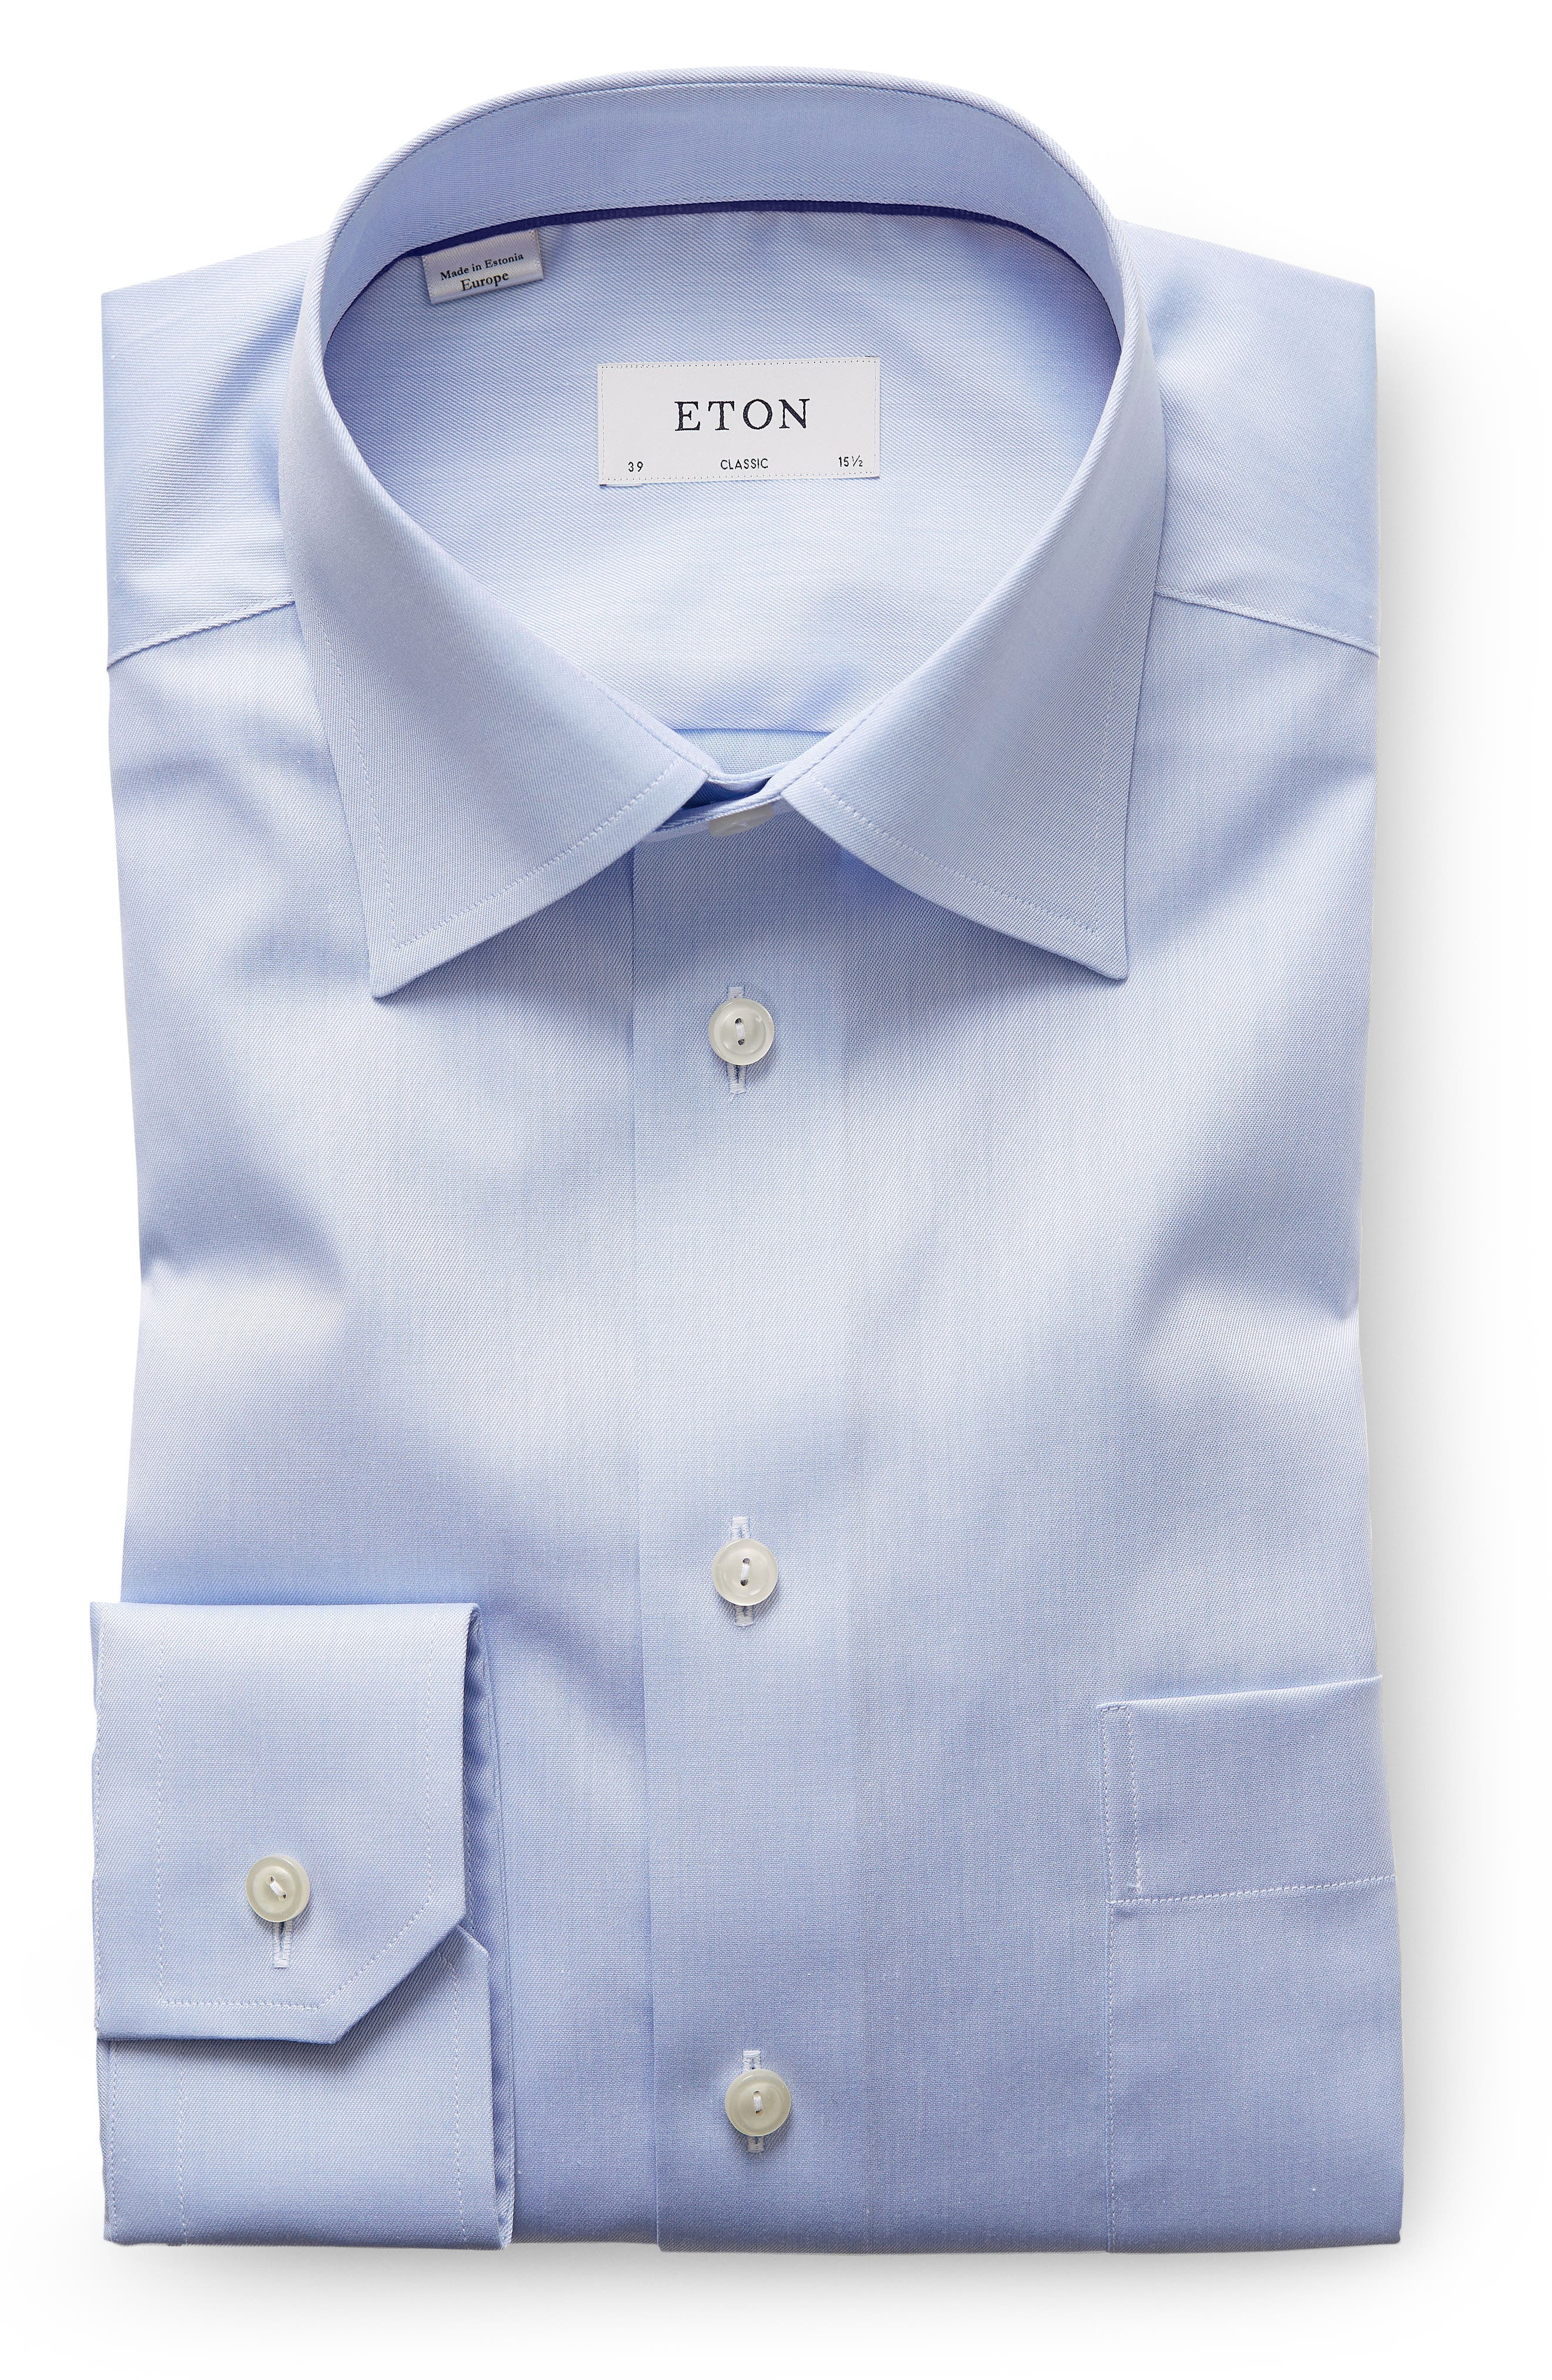 Main Image - Eton Classic Fit Twill Dress Shirt